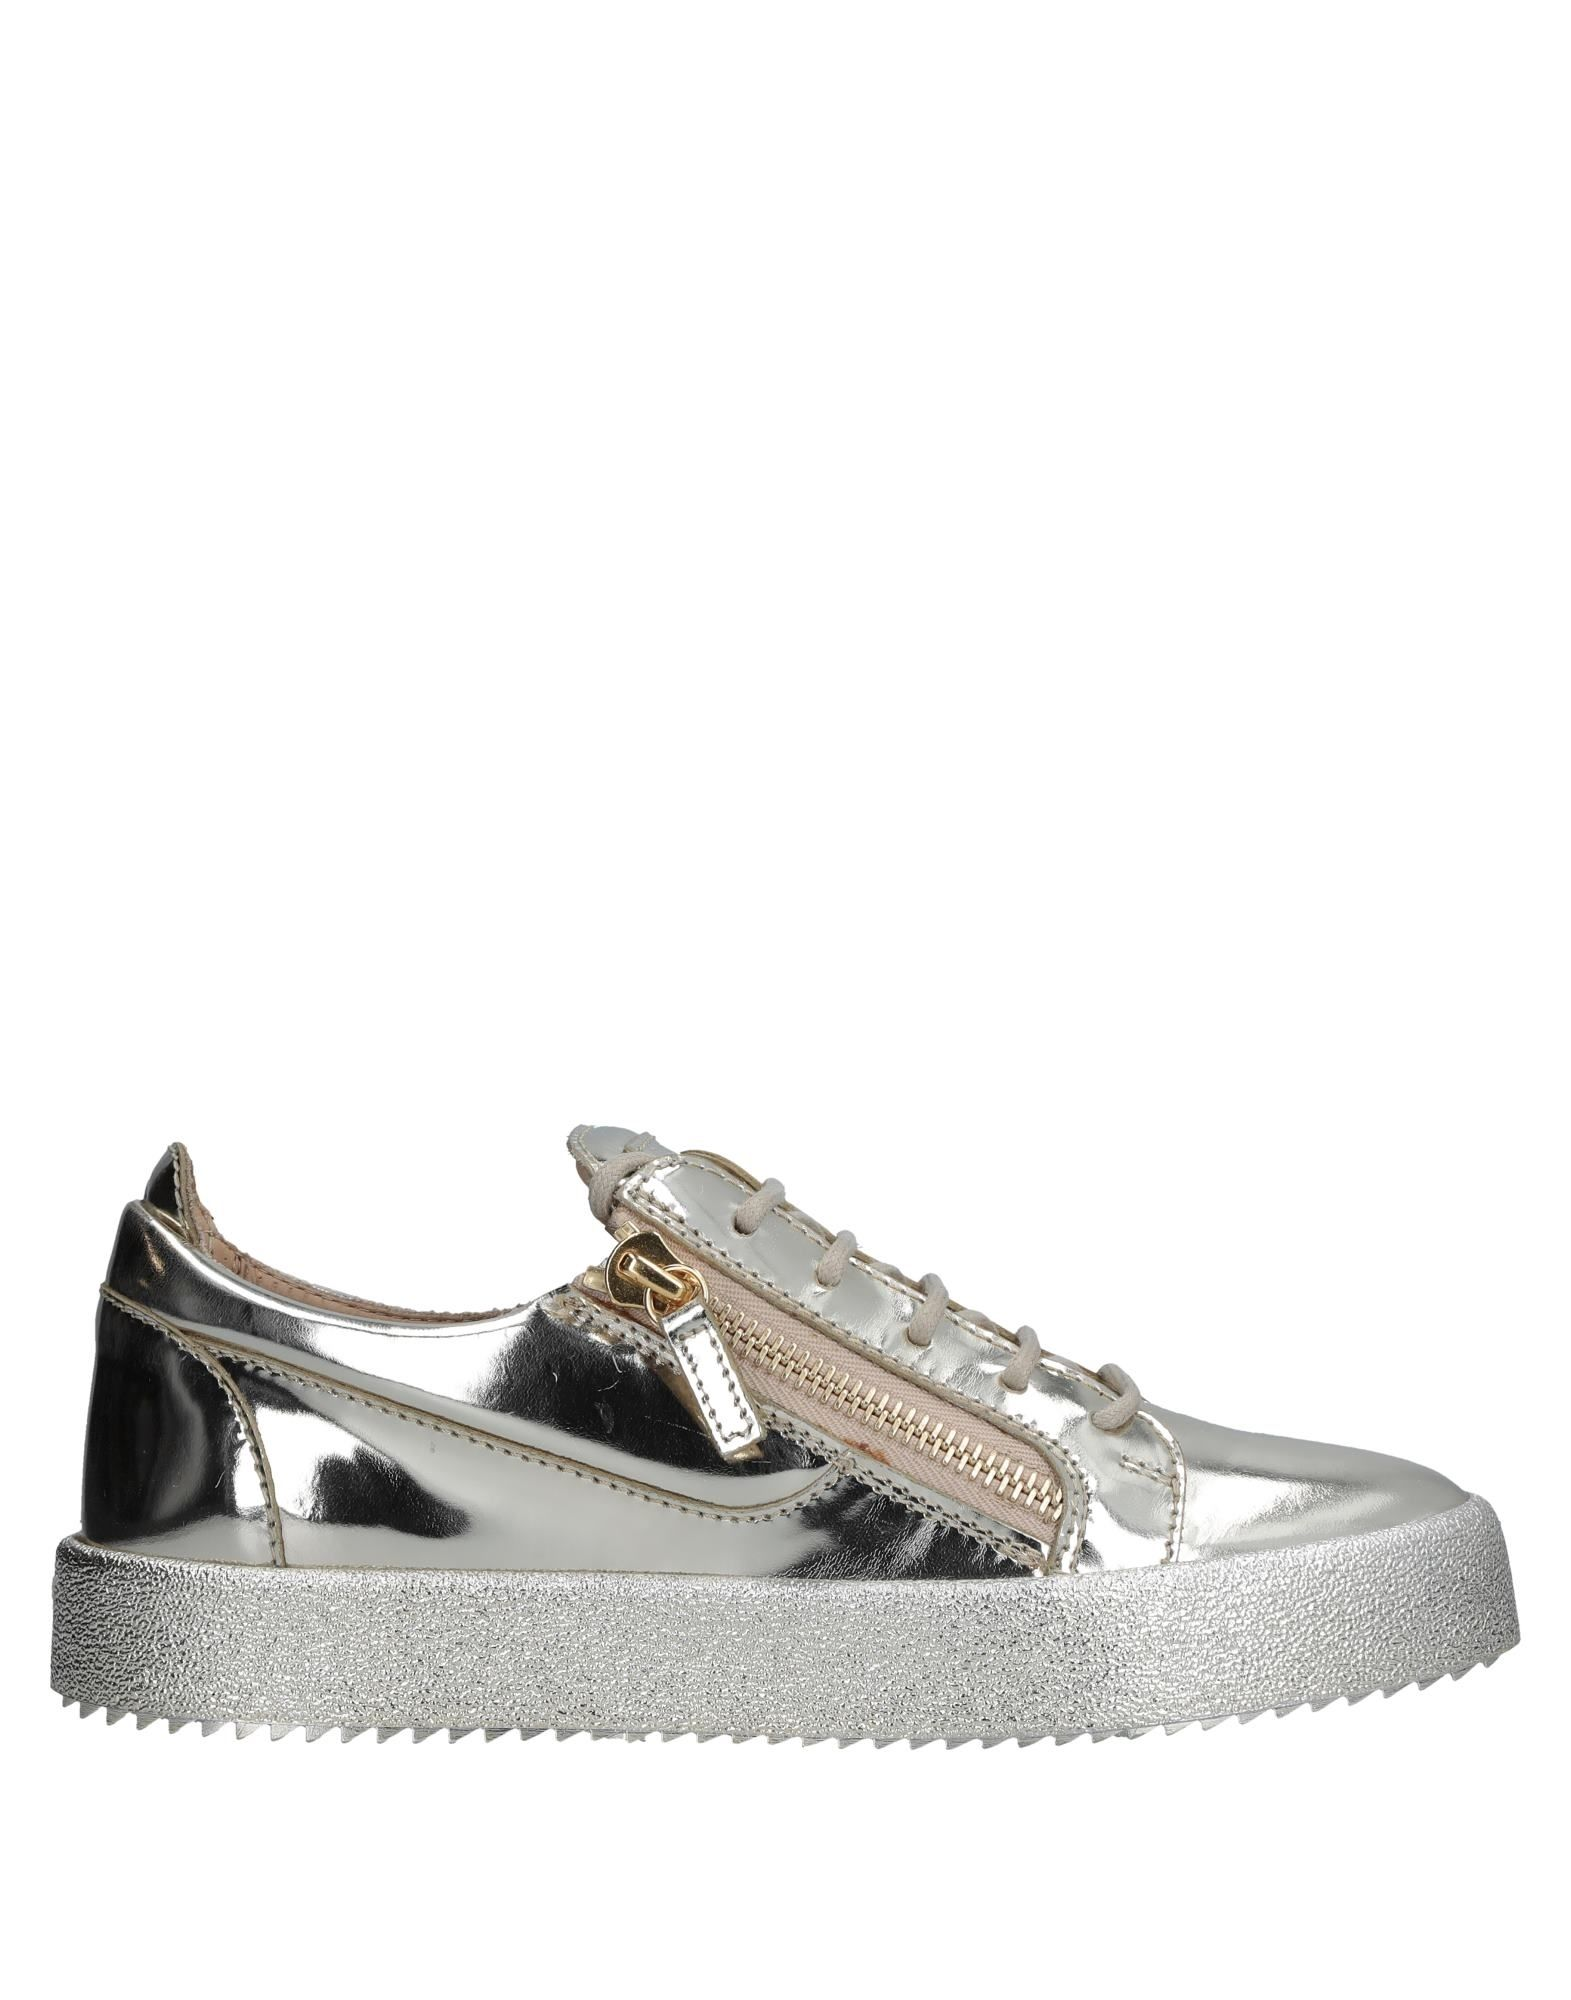 Giuseppe Zanotti Sneakers - Women Giuseppe Zanotti Canada Sneakers online on  Canada Zanotti - 11535801RL 246e2b